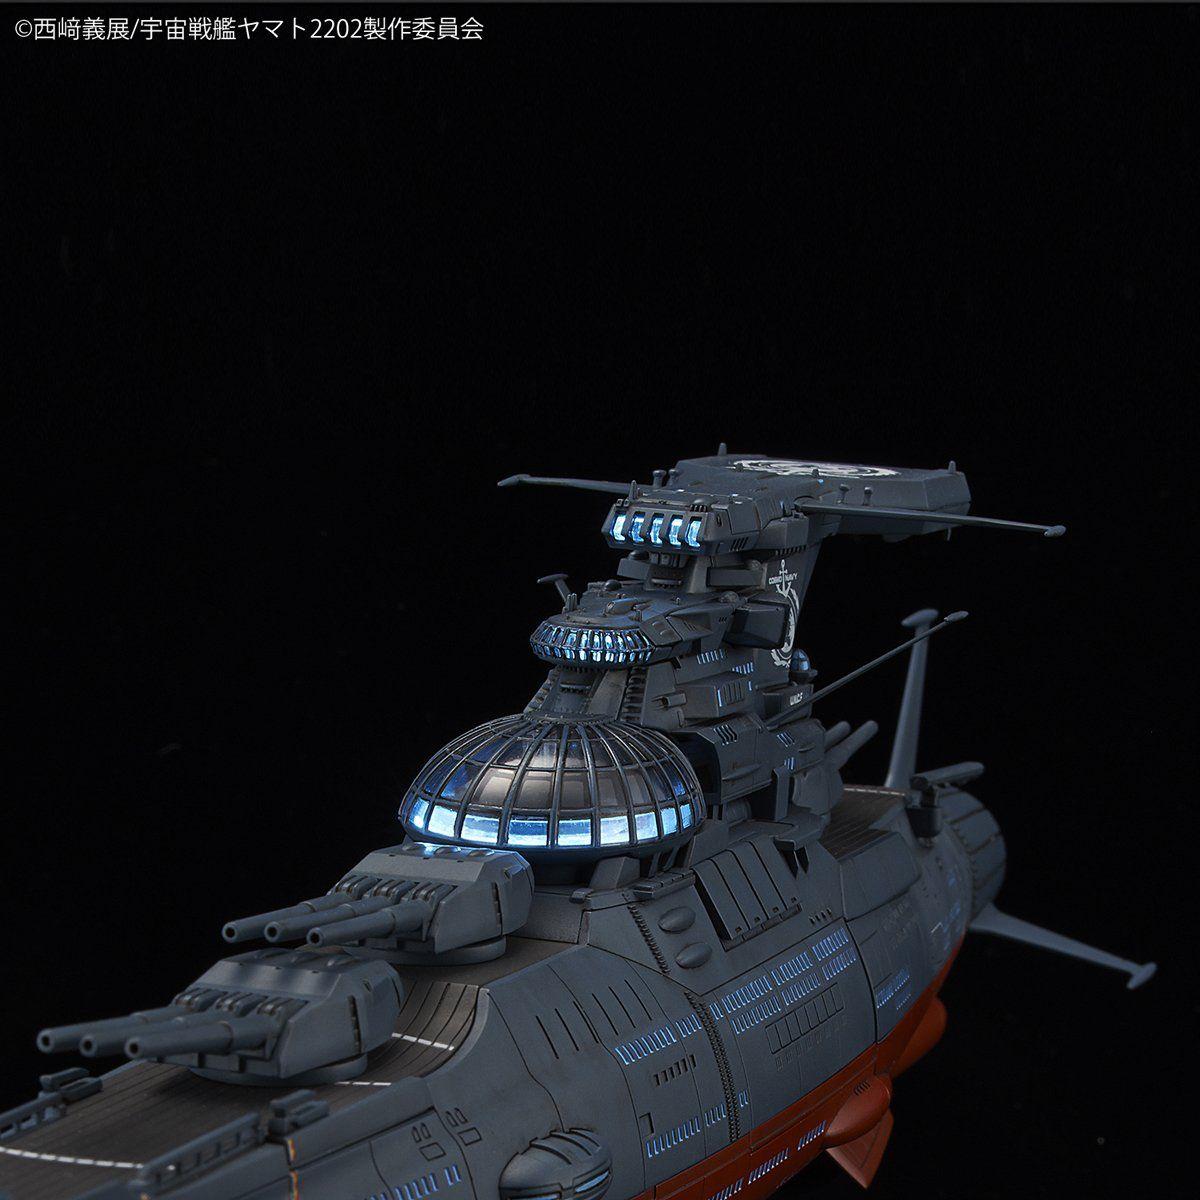 Space Battleship Image By Poten San Pedro On Yamato Space